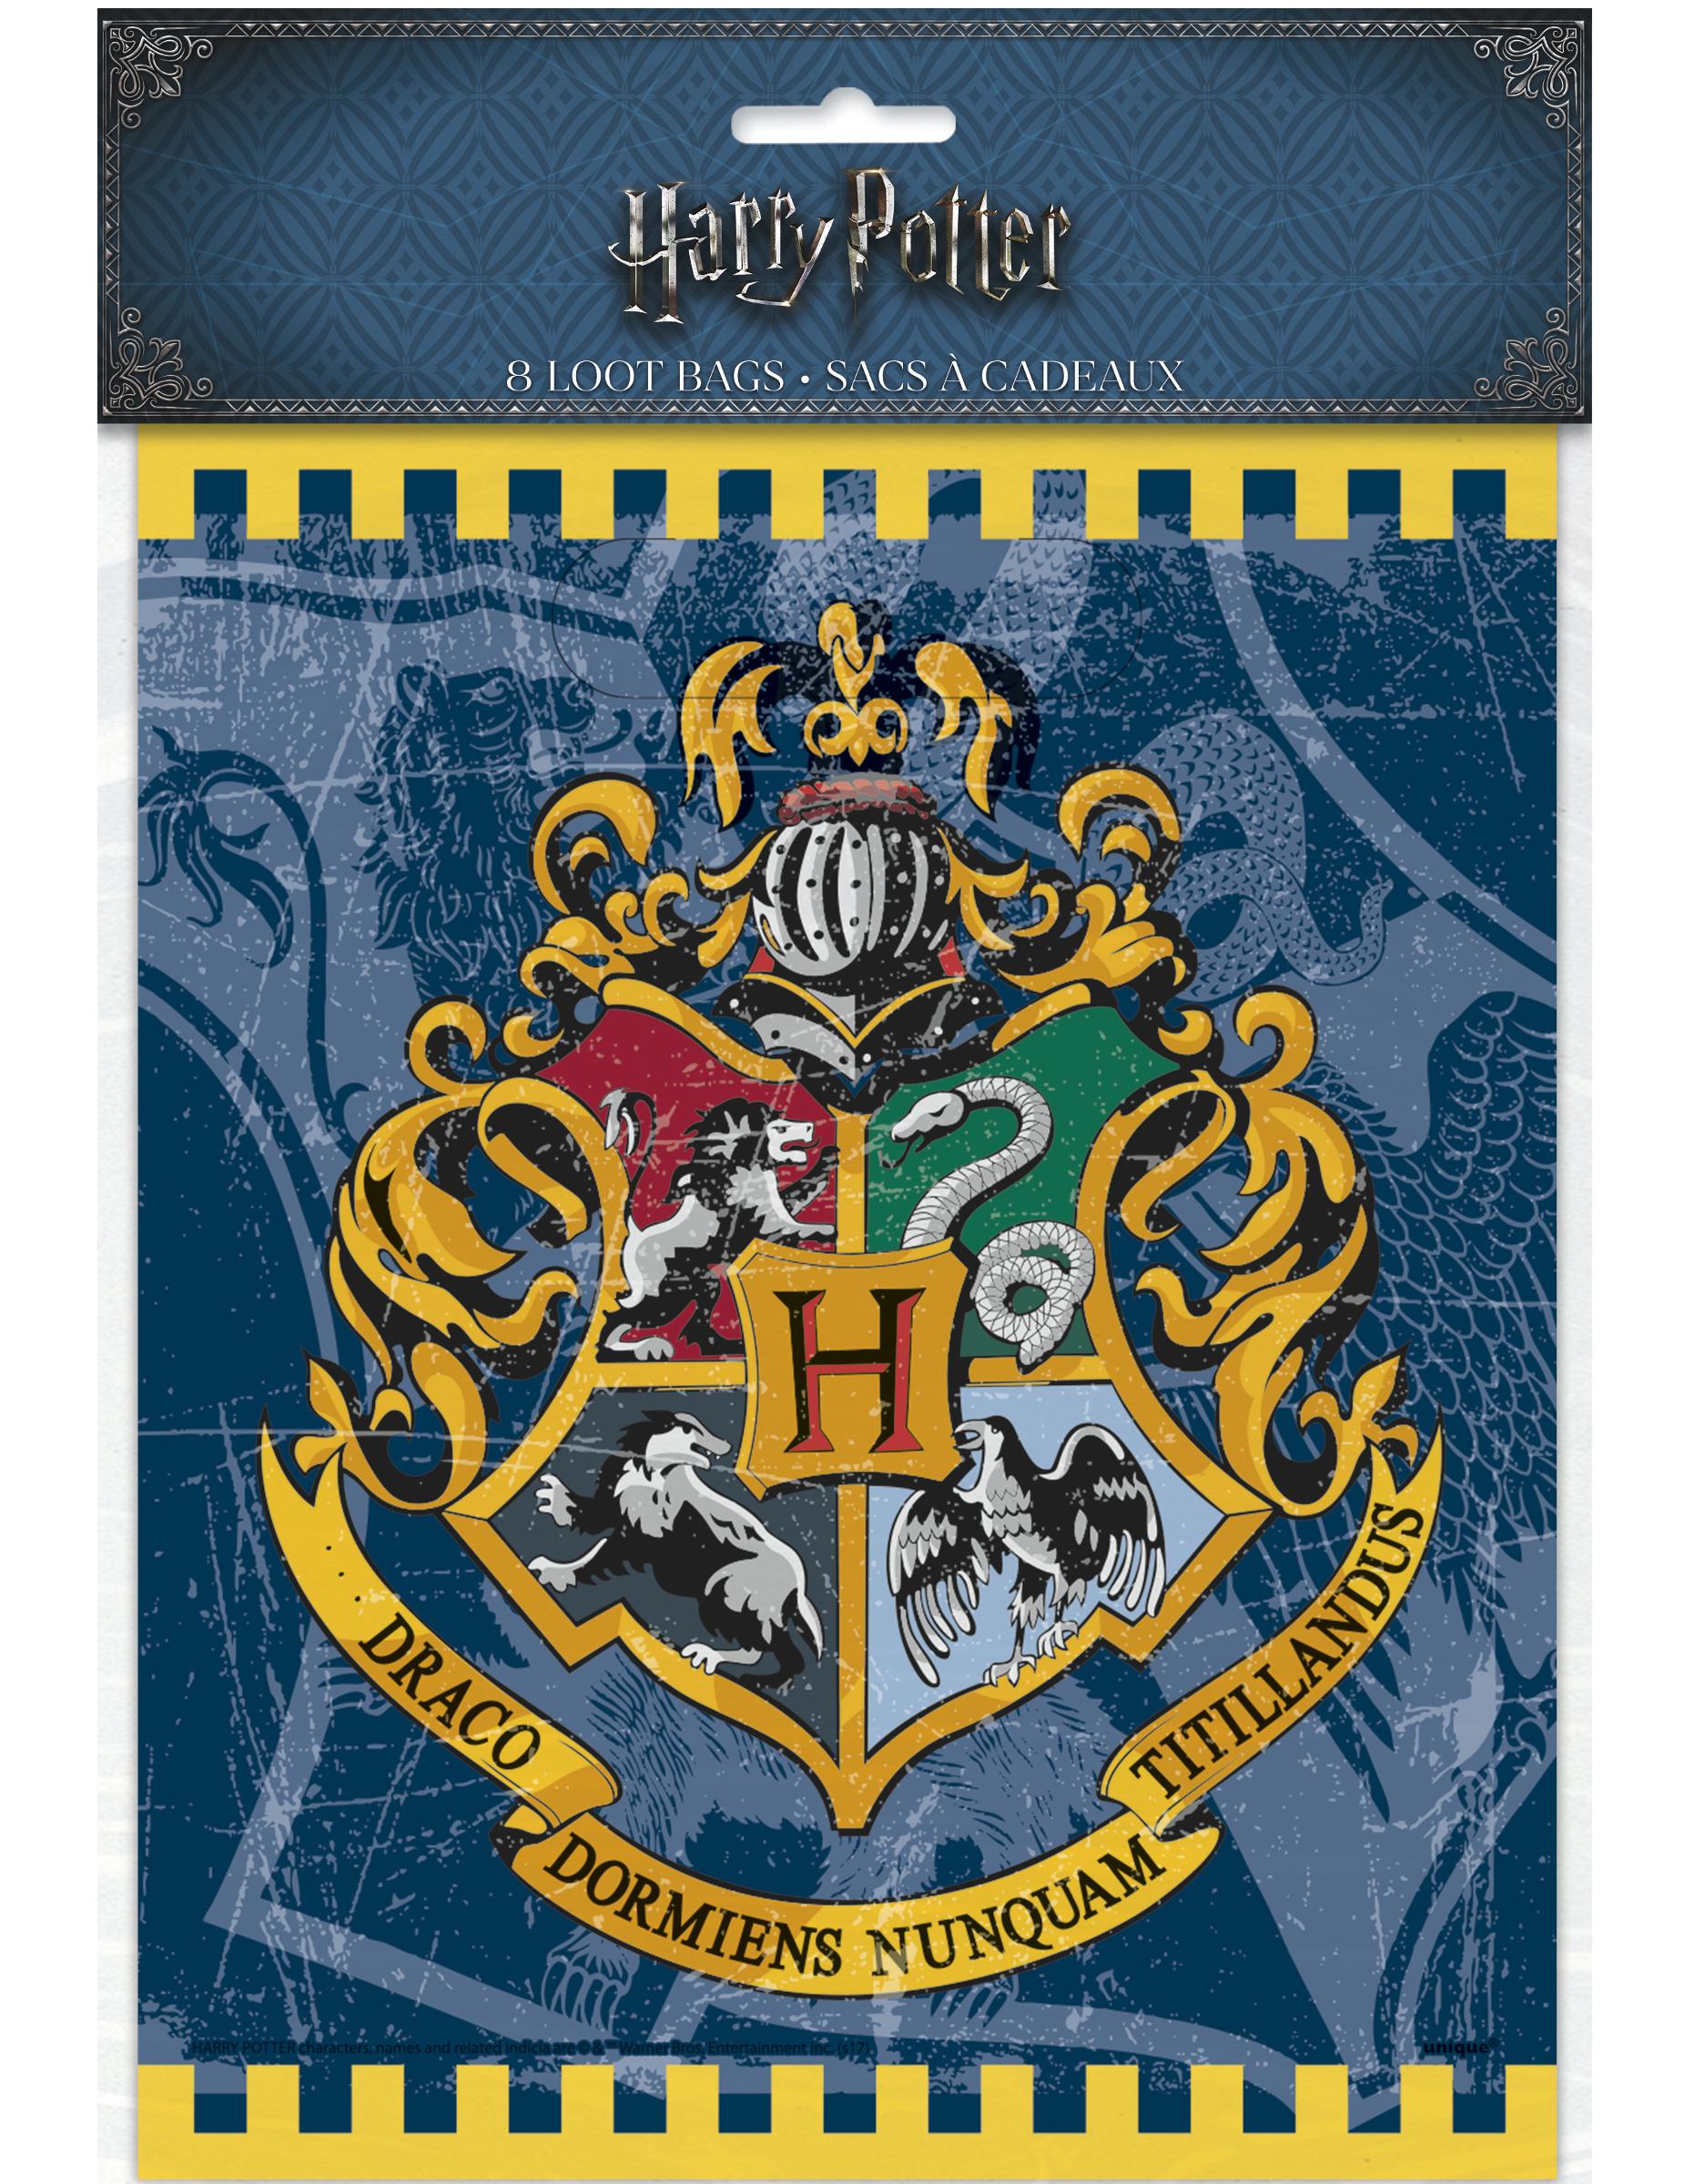 harry potter geschenkt ten hogwarts wappen lizenzware 8 st ck blau bunt 23x19cm g nstige. Black Bedroom Furniture Sets. Home Design Ideas